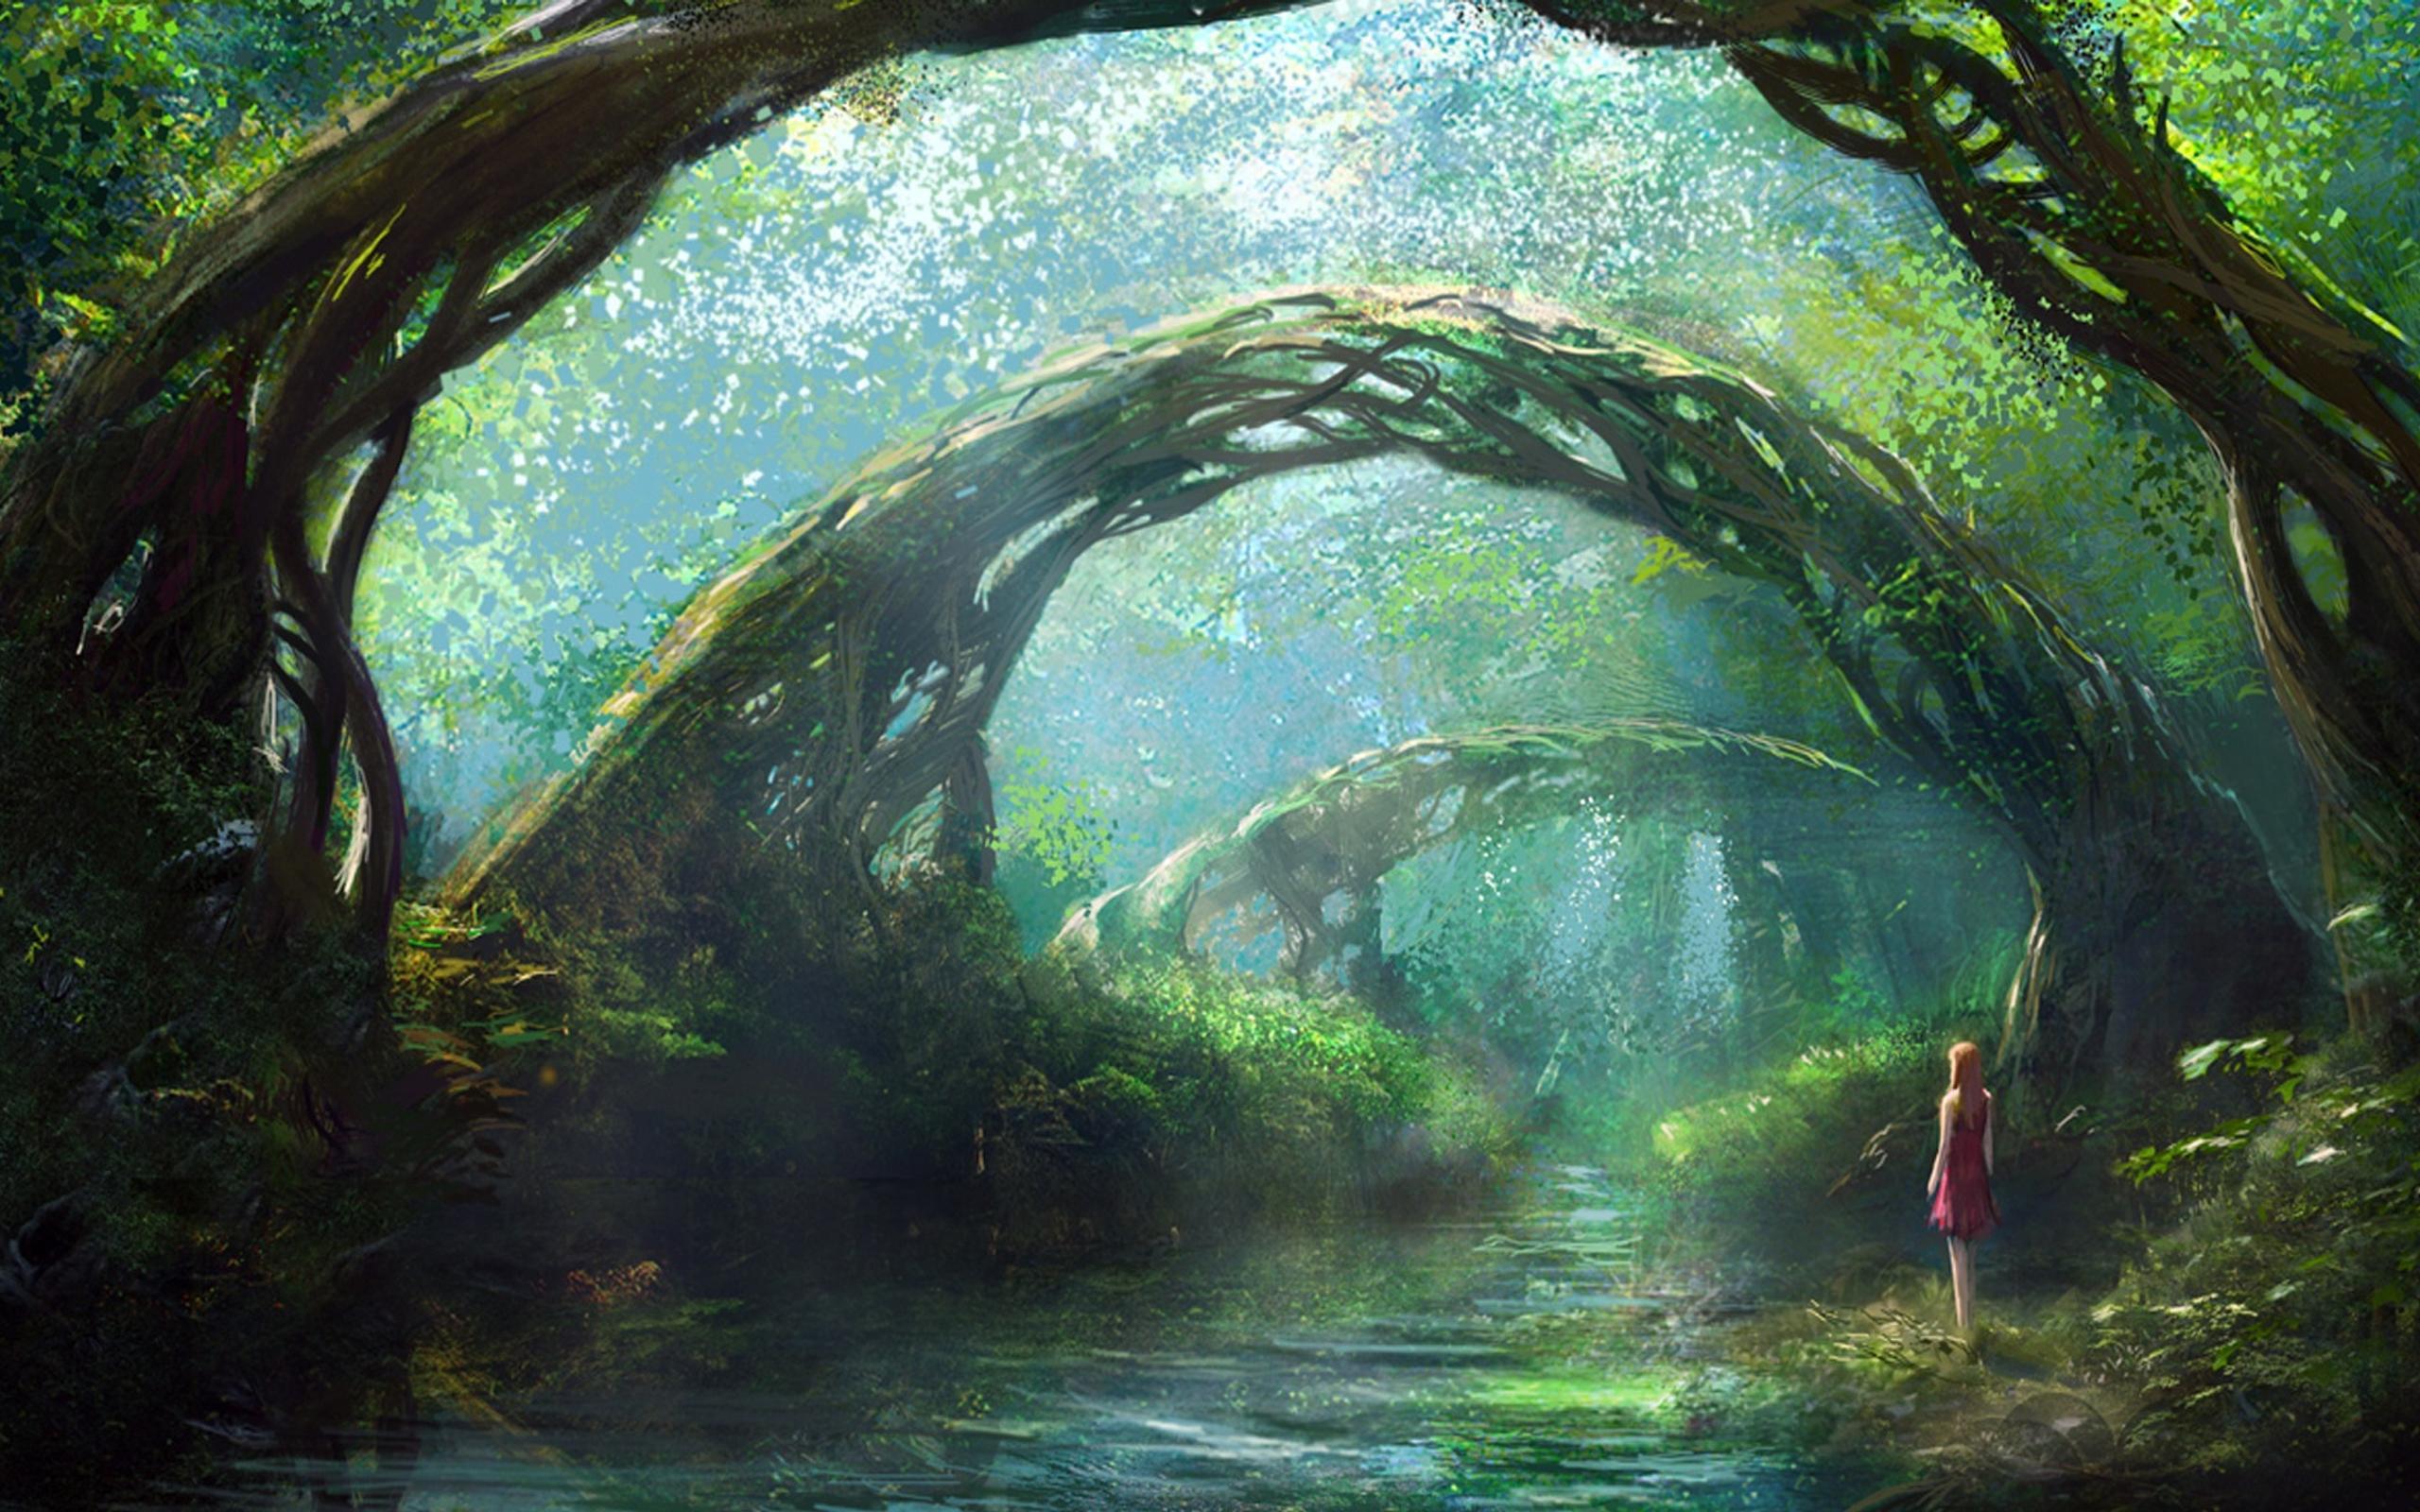 Beautiful Wallpaper Macbook Forest - a-girl-in-fantasy-forest-hd-wallpaper-2560x1600  Trends_346861.jpg